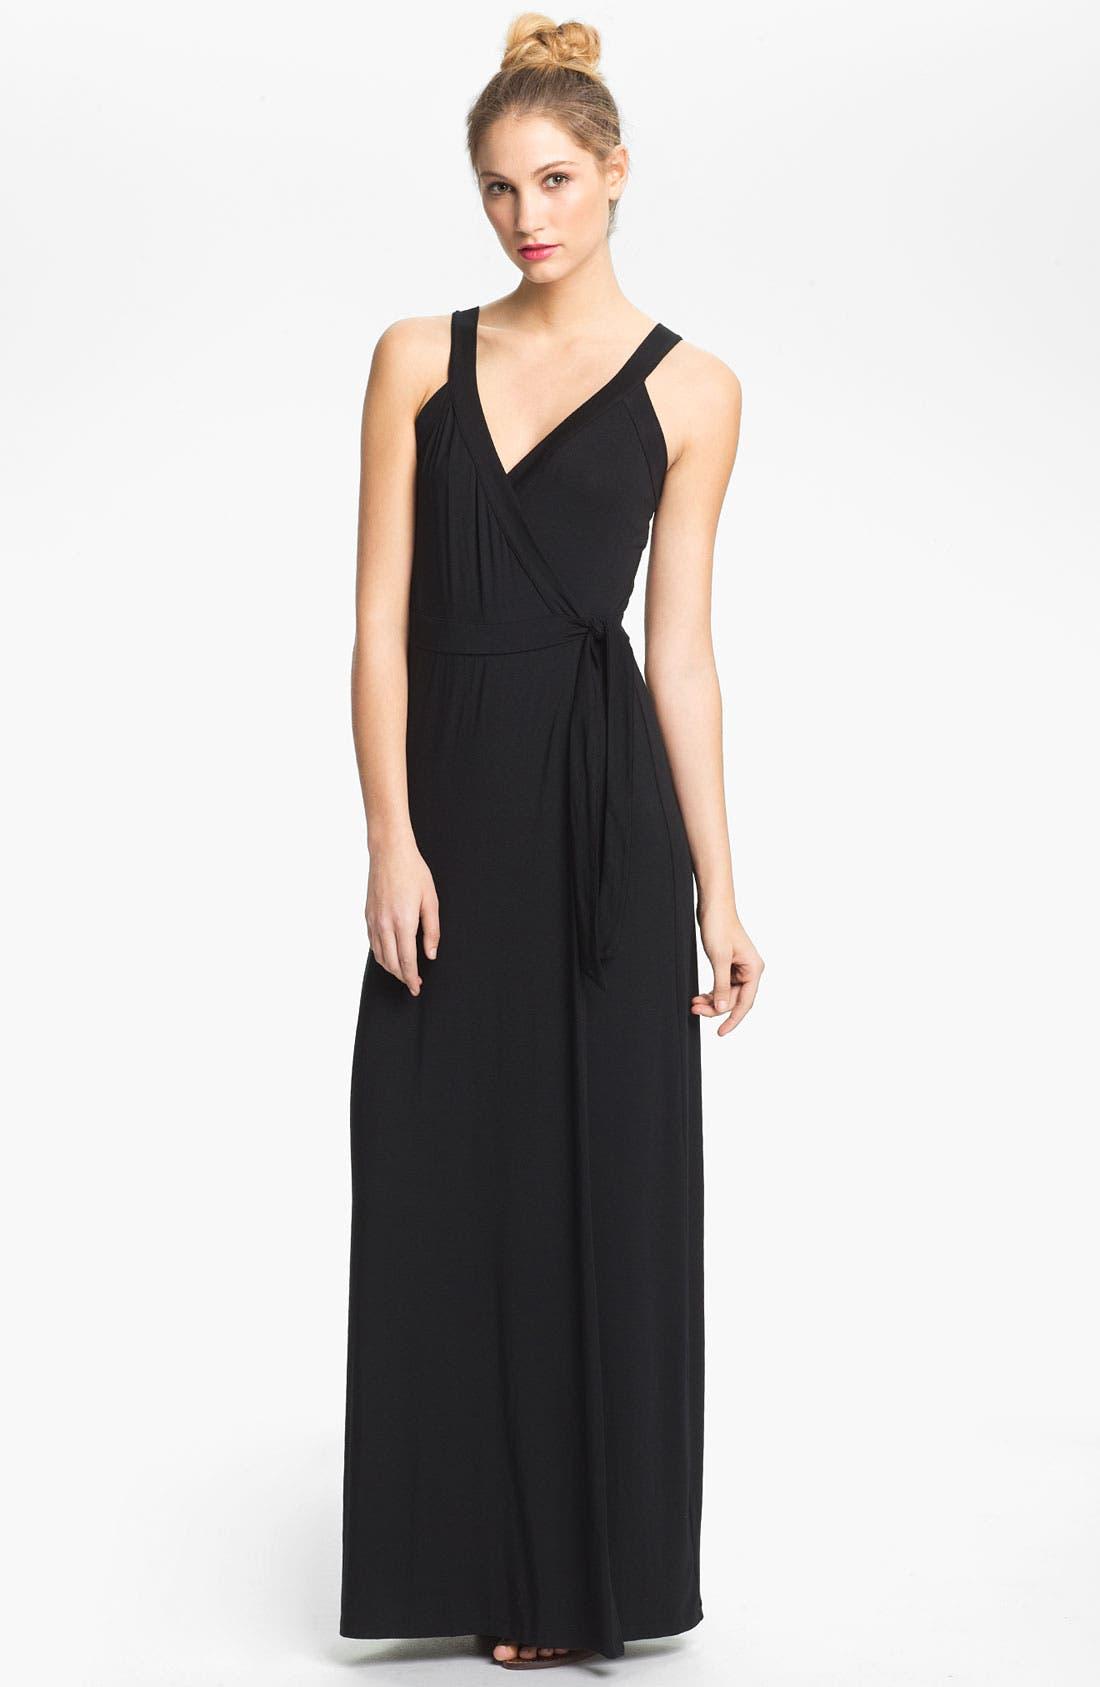 Main Image - Tart 'Camille' Sleeveless Jersey Wrap Maxi Dress